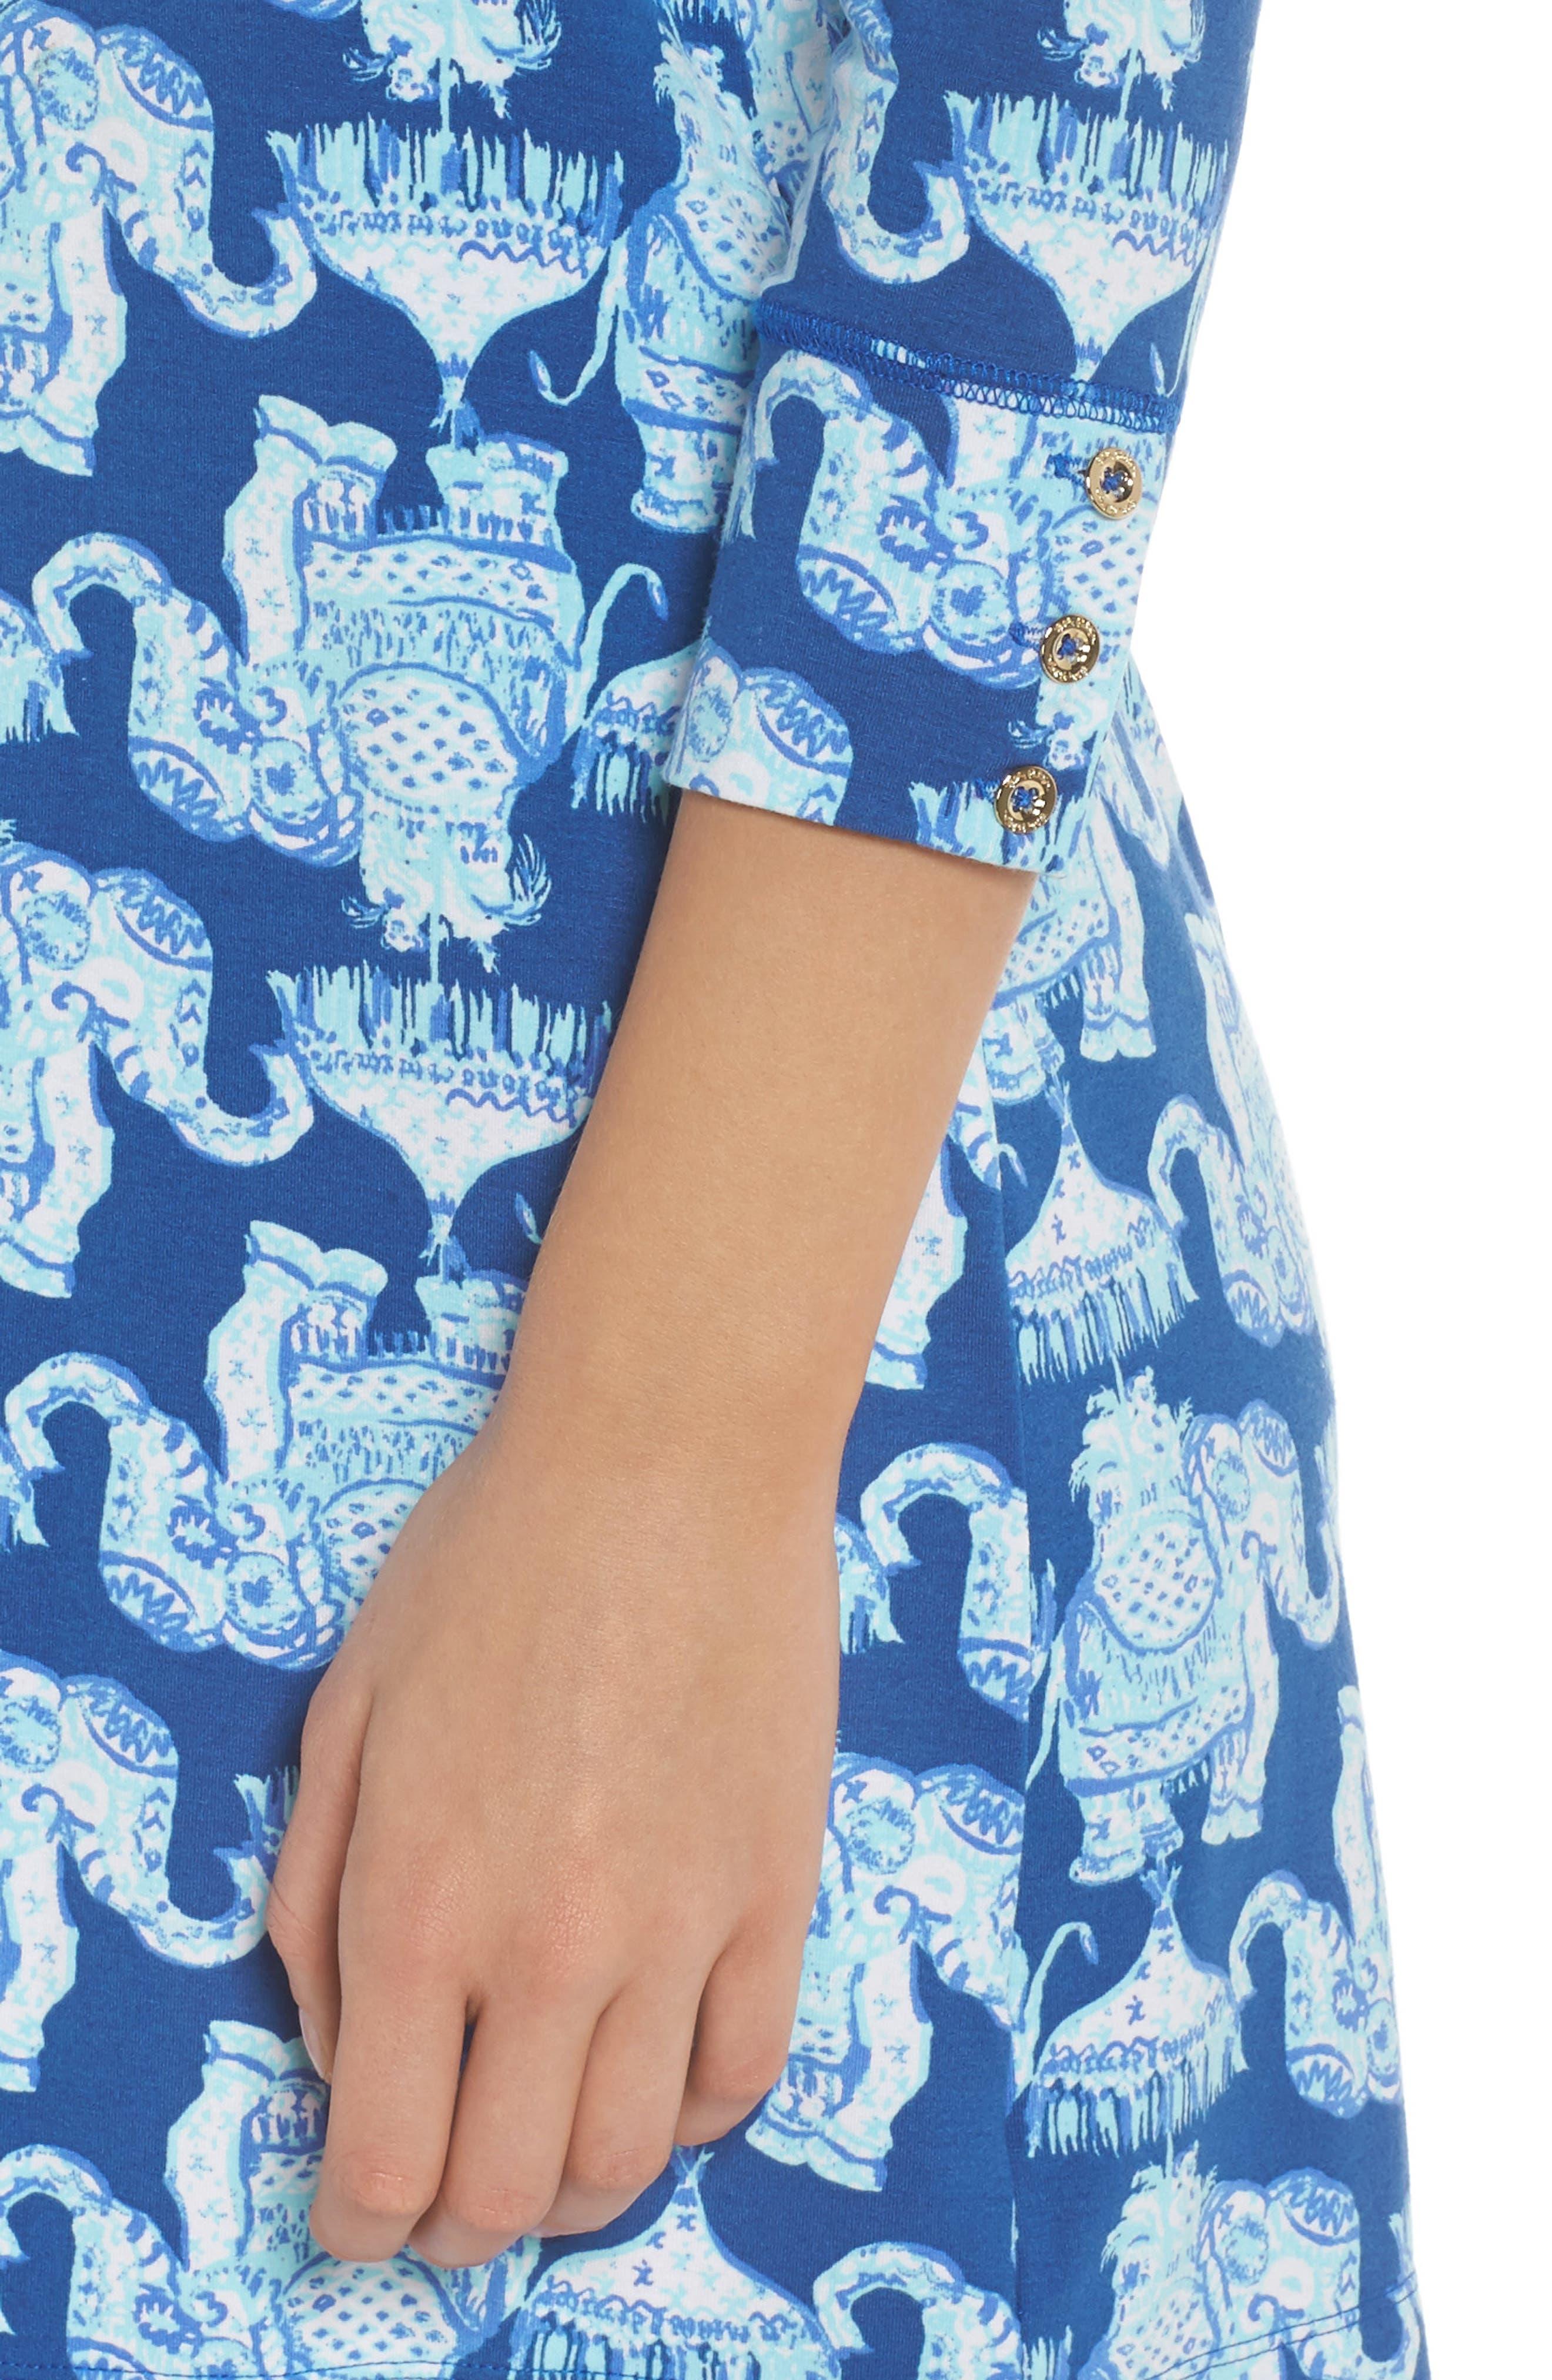 Sophie UPF 50+ Shift Dress,                             Alternate thumbnail 4, color,                             Deep Indigo Joy Ride